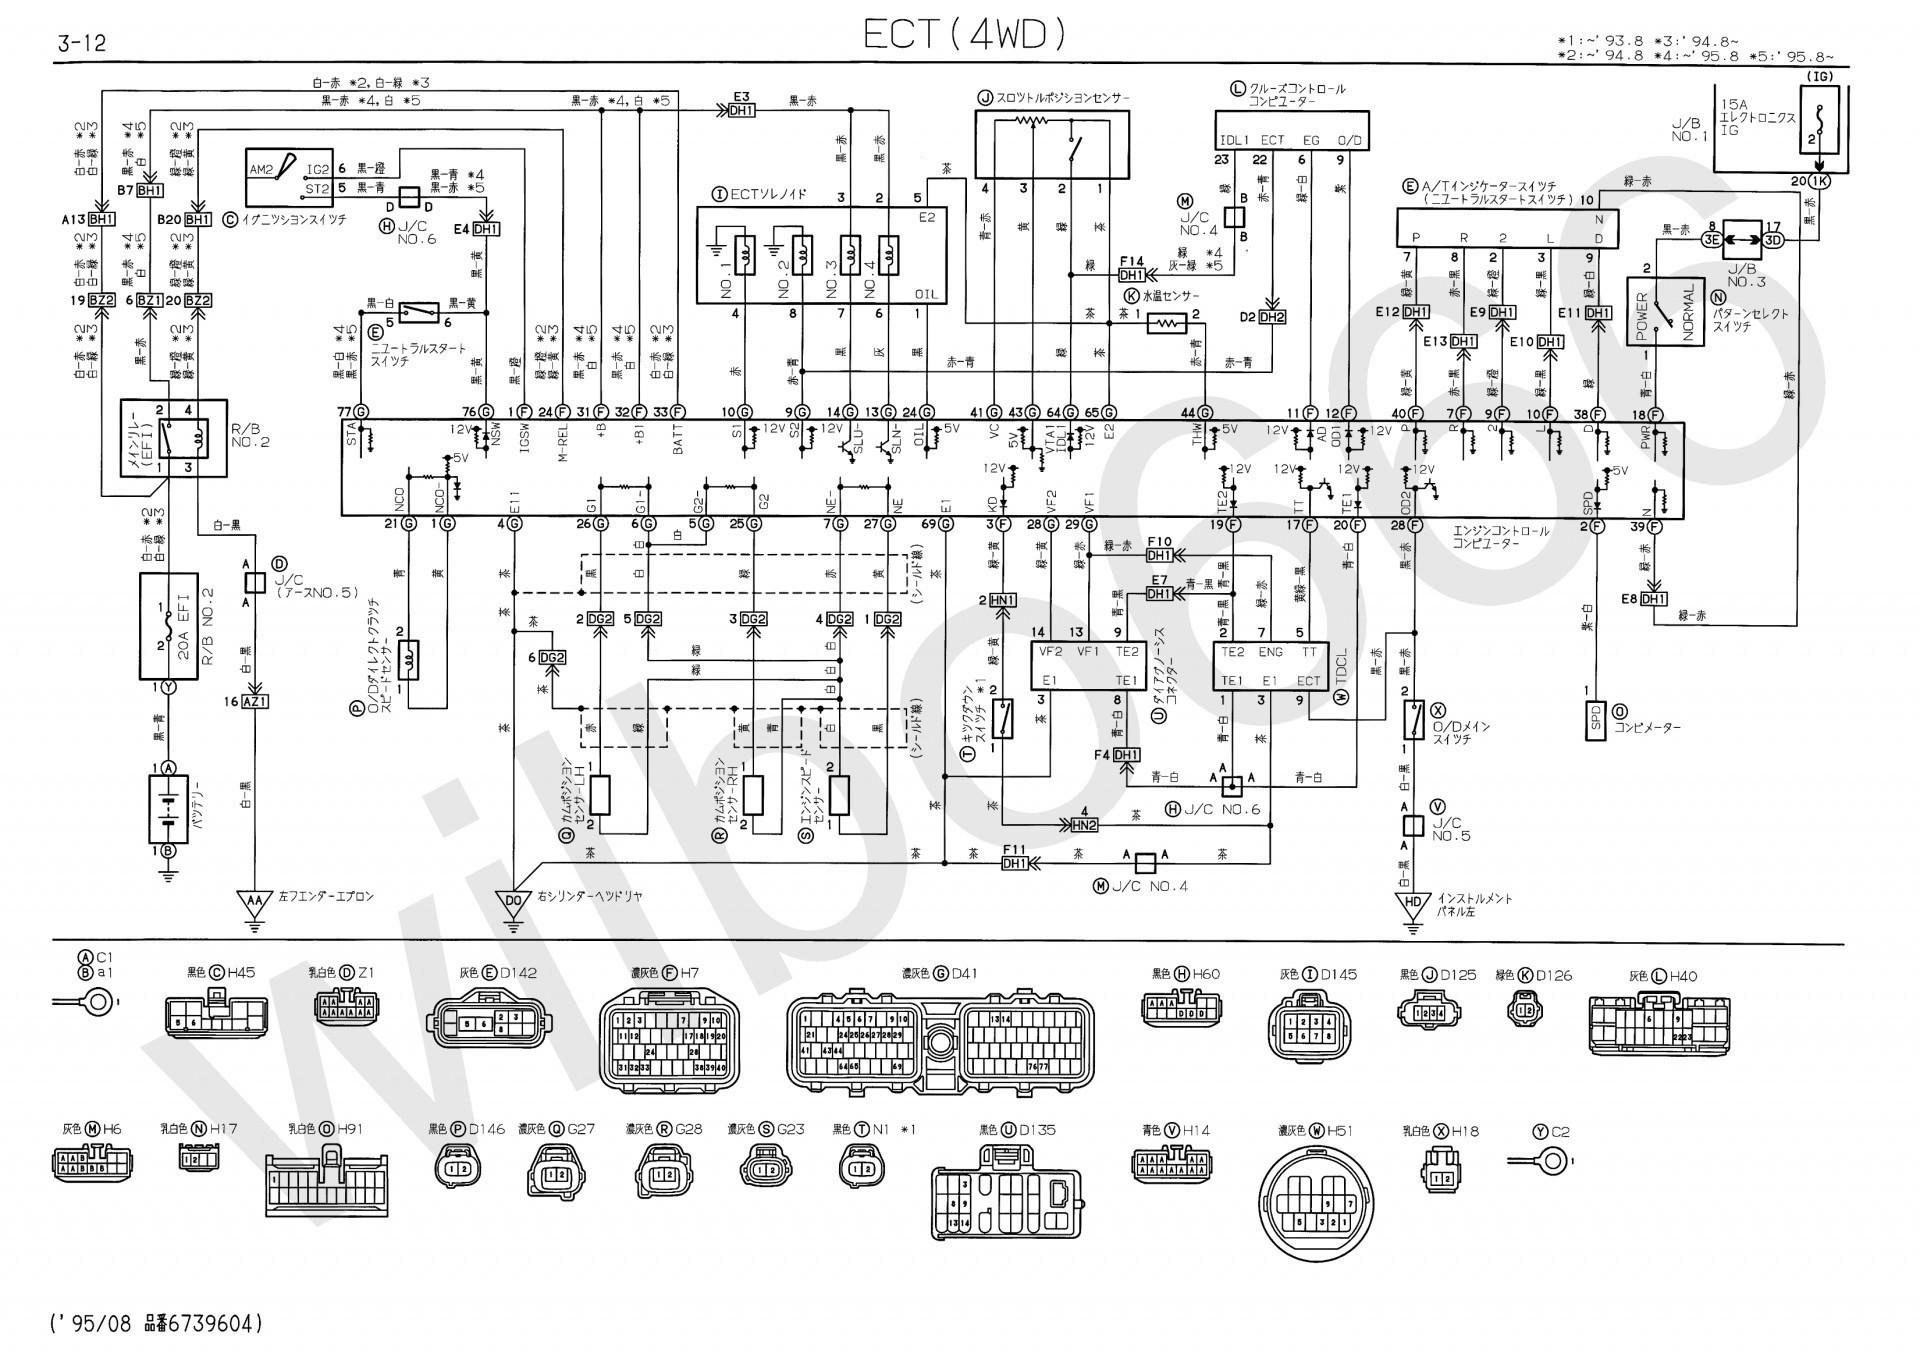 Auto Engine Diagram Bmw Engine Diagram New Electrical Floor Plan 2004 2010 Bmw X3 E83 3 Of Auto Engine Diagram